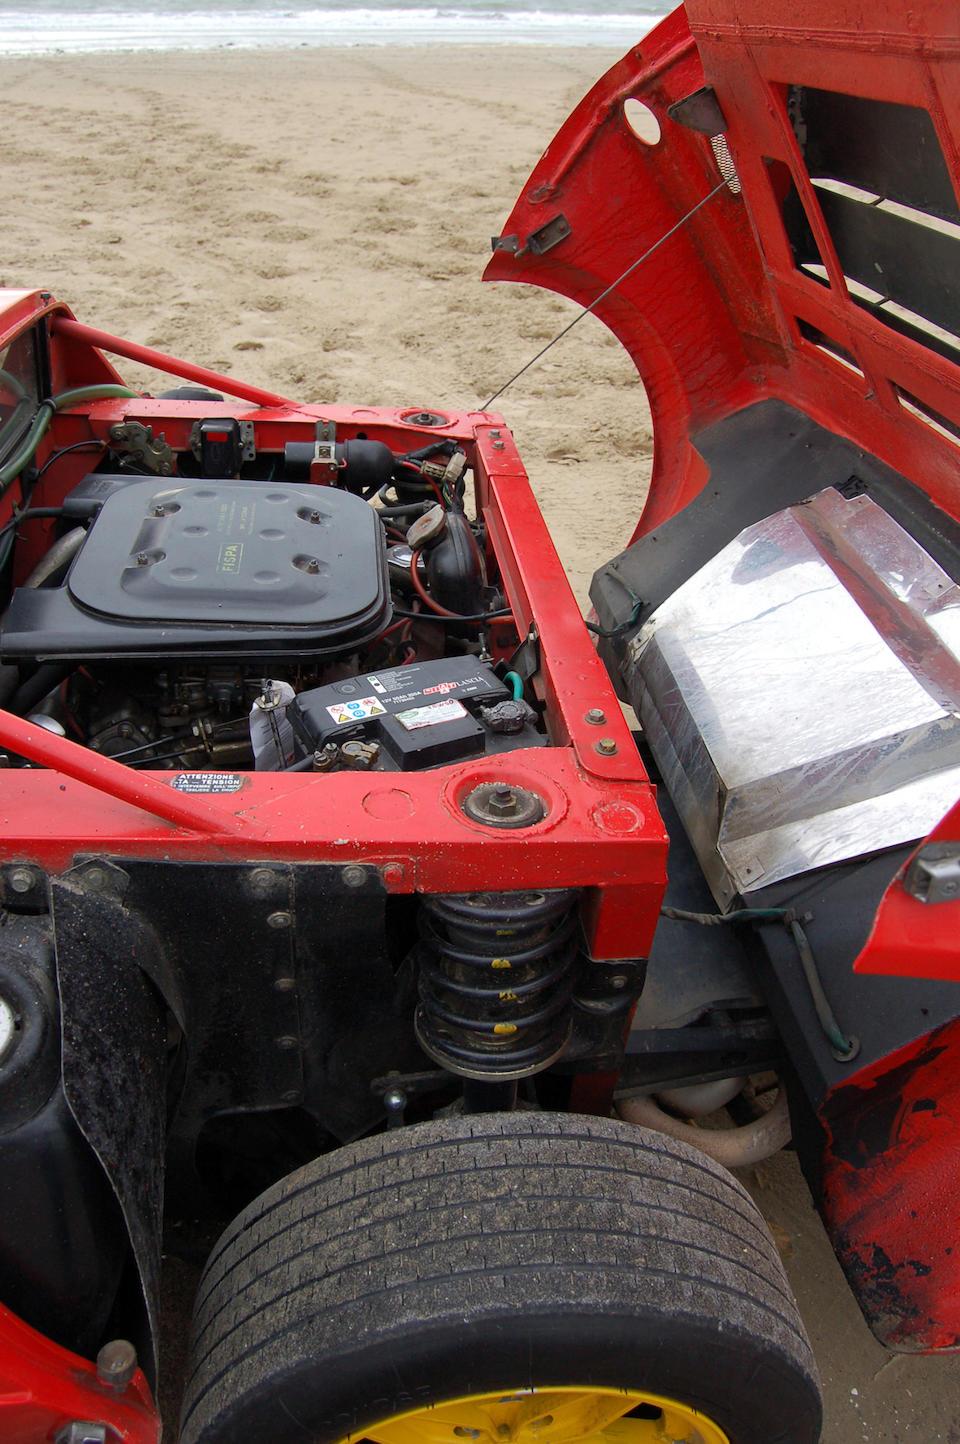 24,000 kilometres from new,1974 Lancia Stratos HF Stradale Coupé  Chassis no. 229 ARO 01646 Engine no. 829 ARO 3103